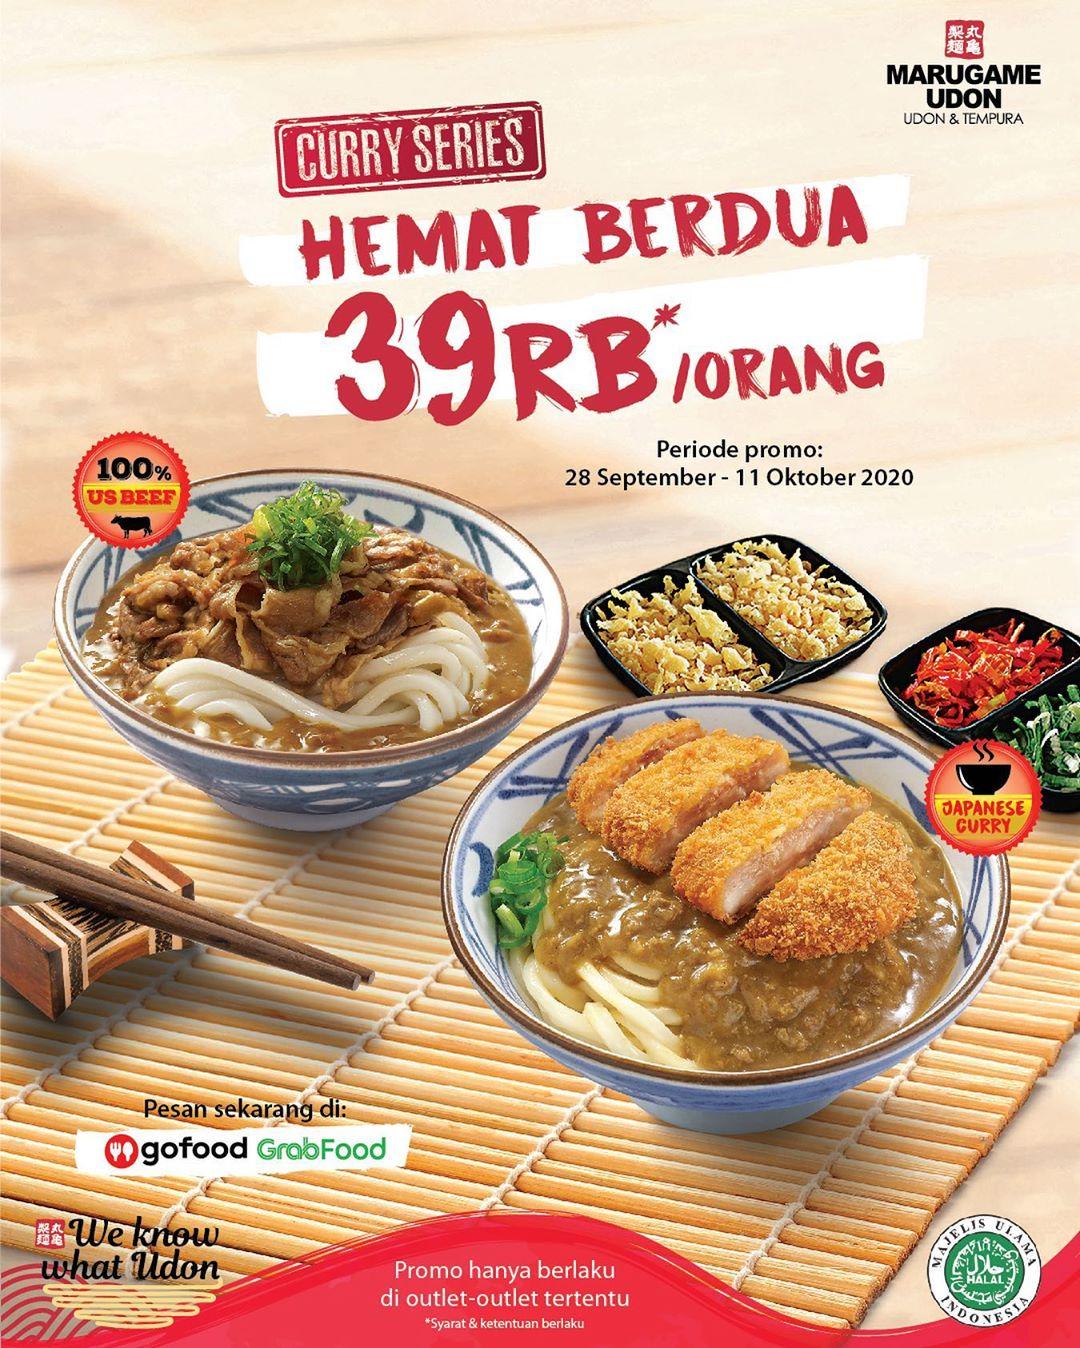 Curry Series! HEMAT BERDUA 39RB/ORANG